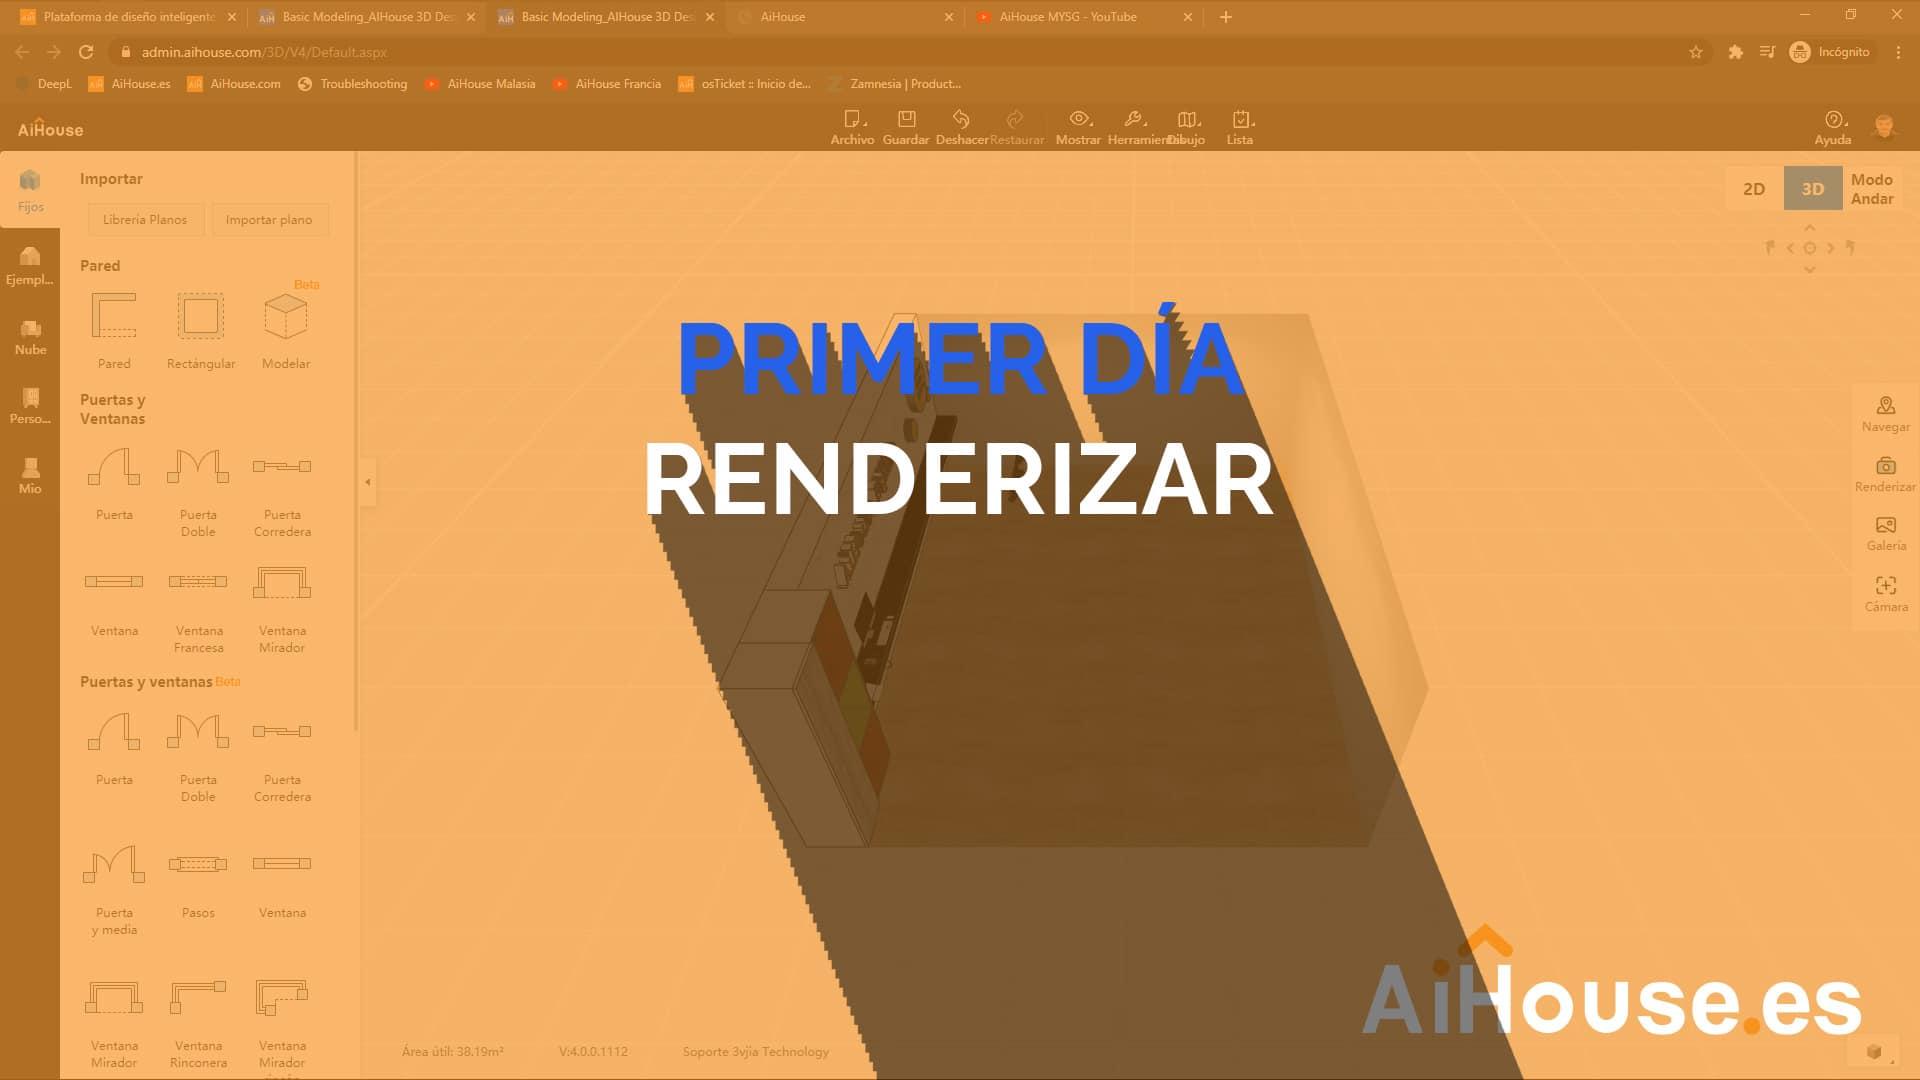 Formación AiHouse en Español - Día 1 - Renderizar